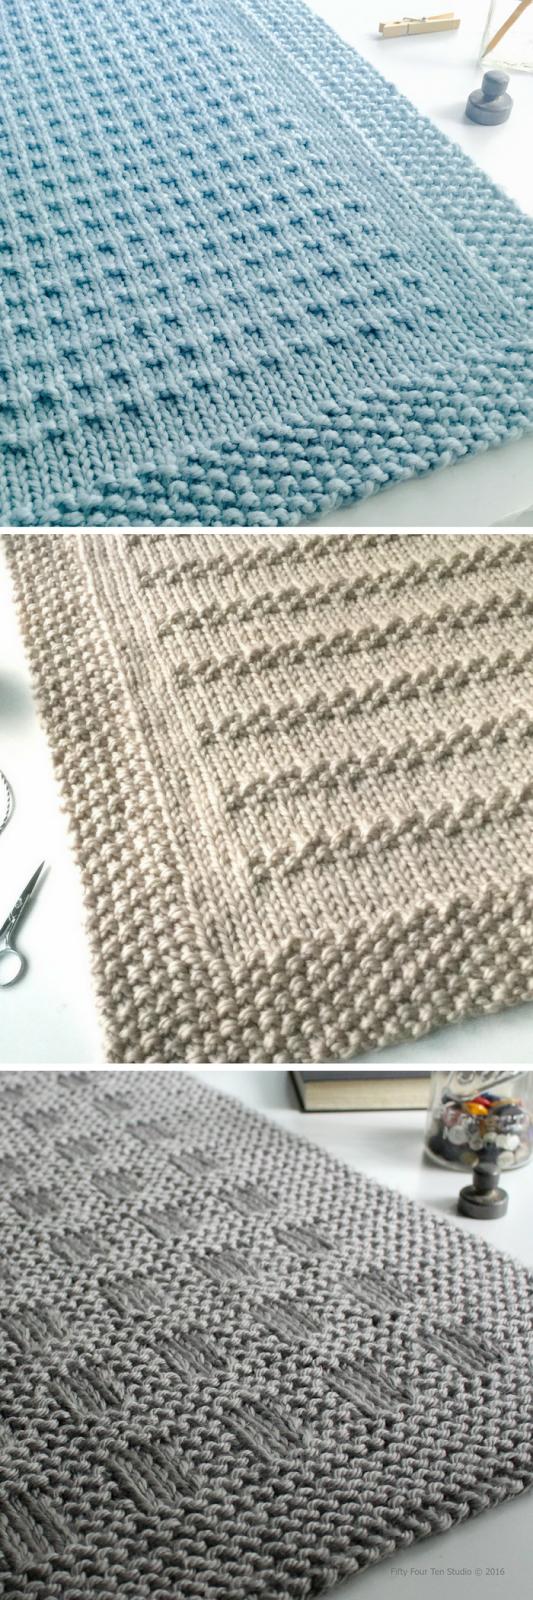 My Favorite Knitting Pattern Highlights from 2016 | Medium throws ...